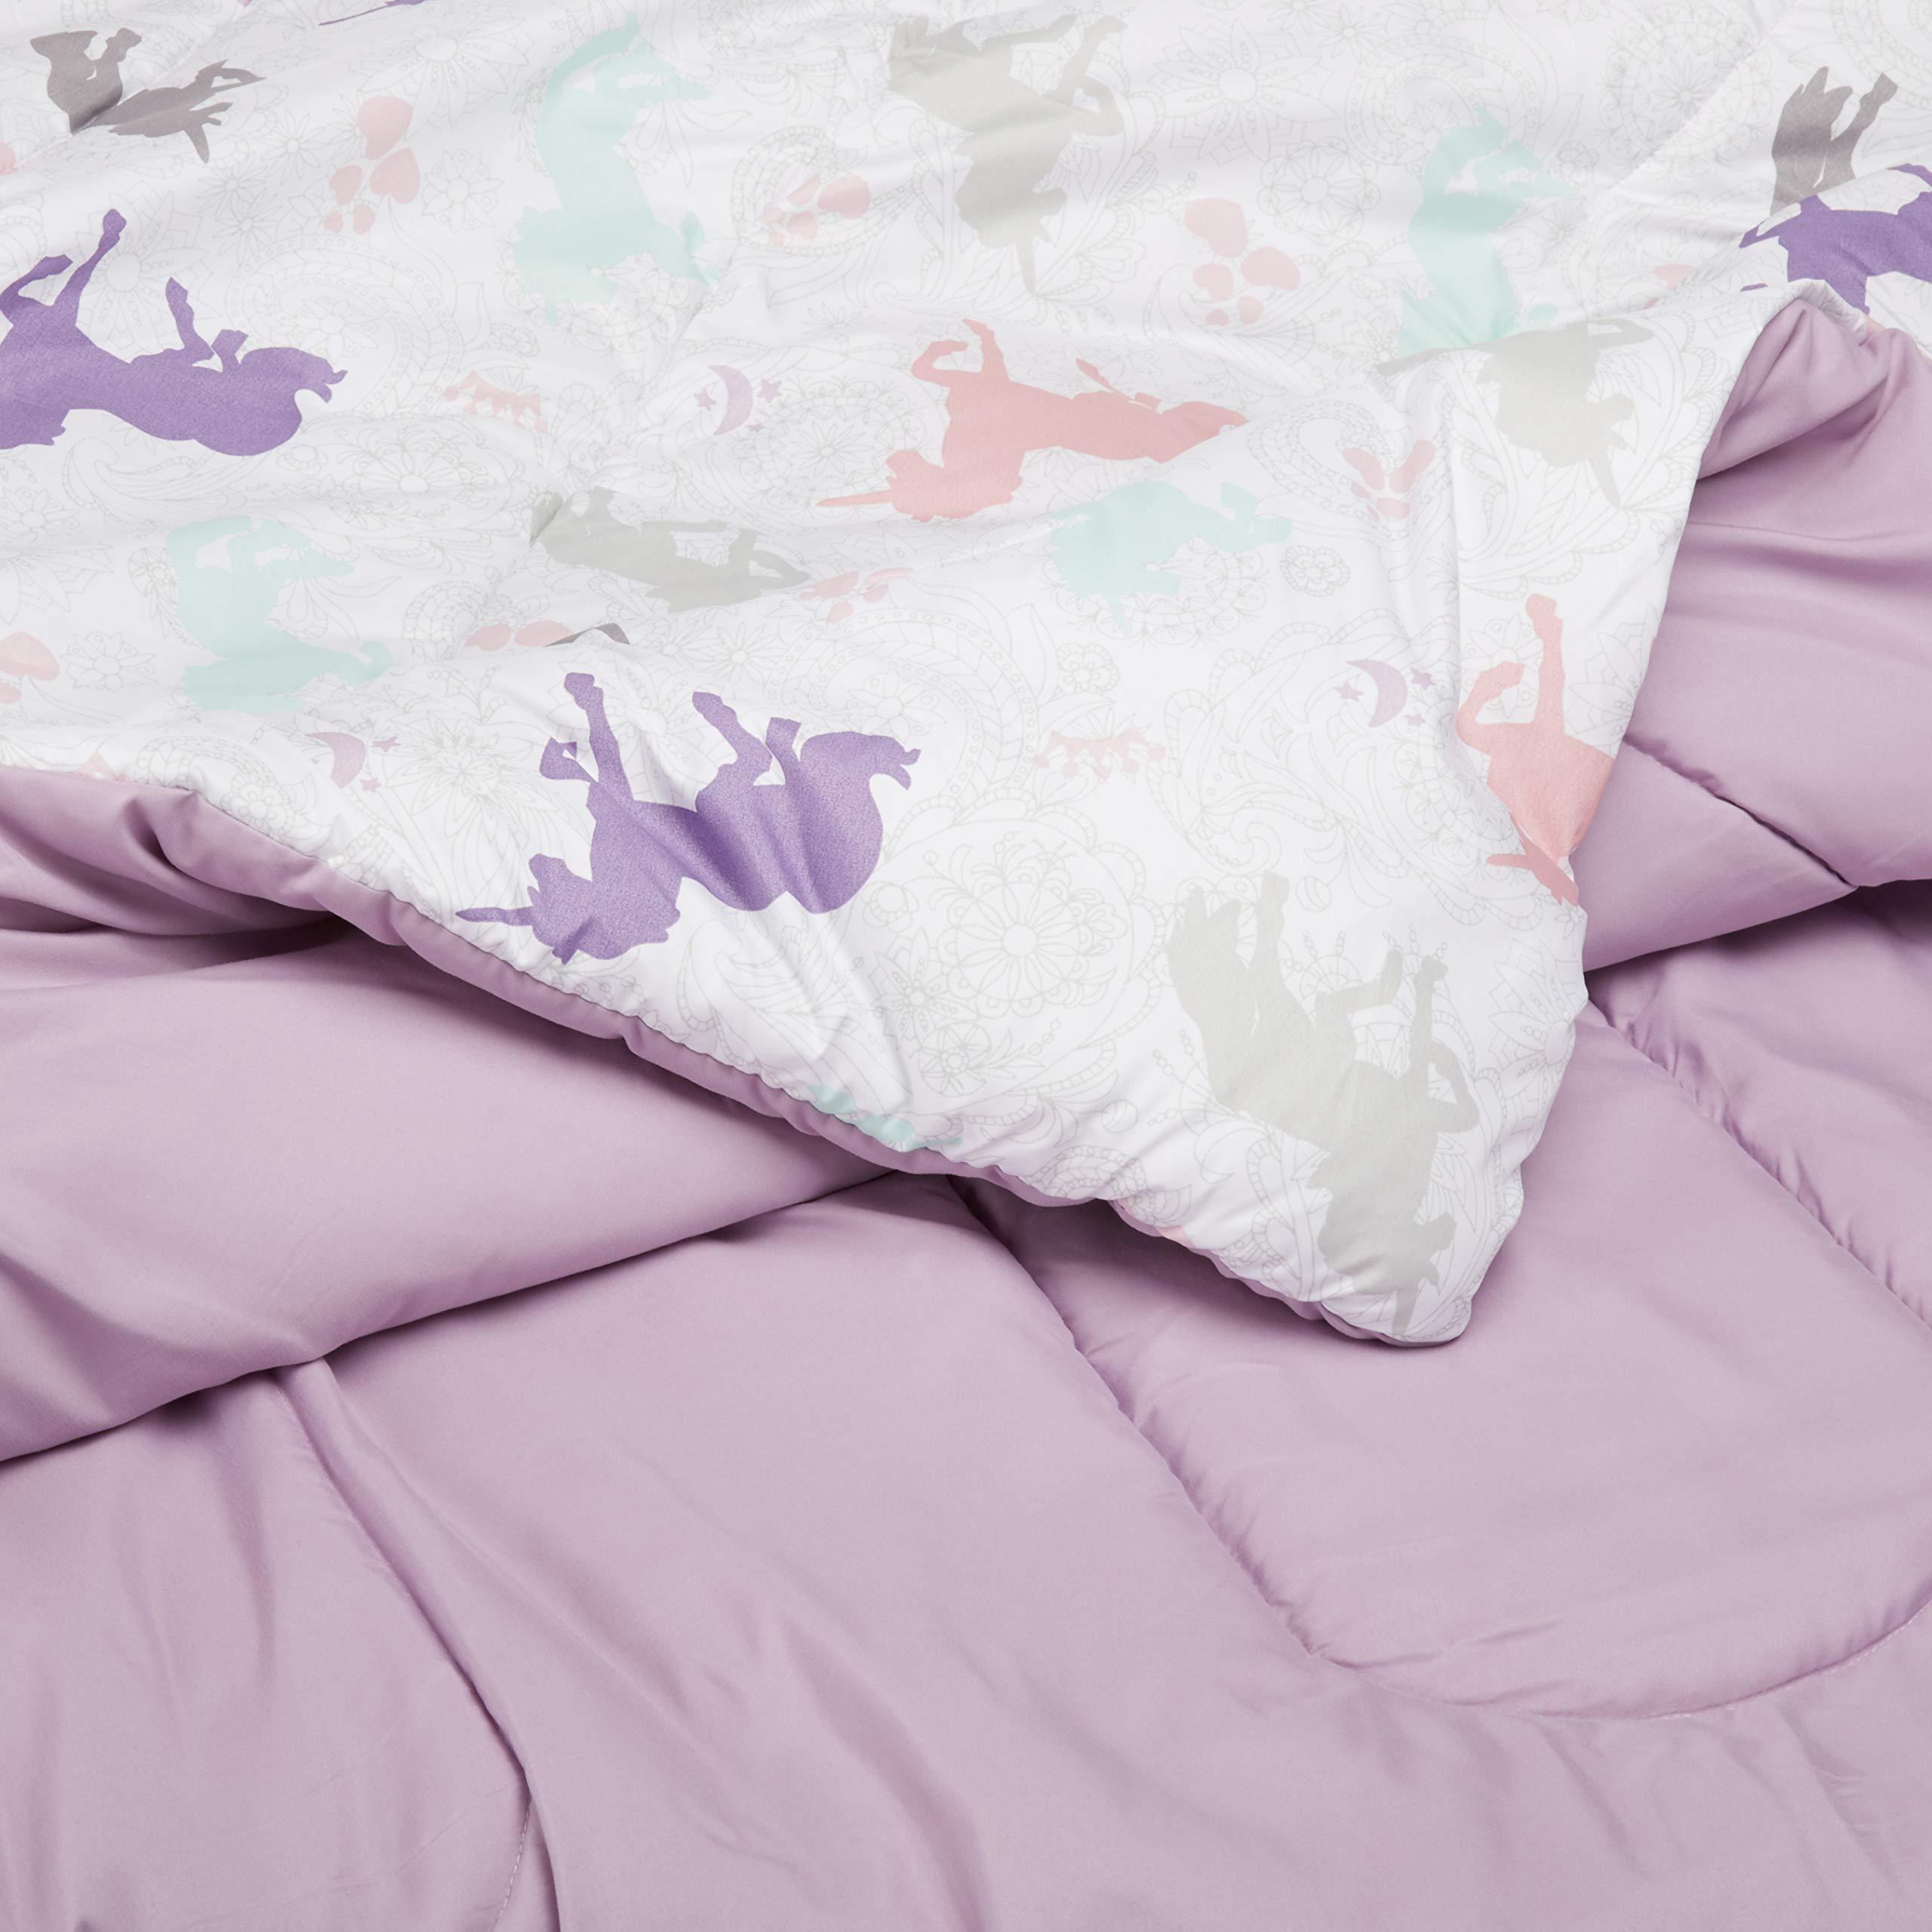 AmazonBasics Kid's Comforter Set - Soft, Easy-Wash Microfiber - Twin, Purple Unicorns by AmazonBasics (Image #5)